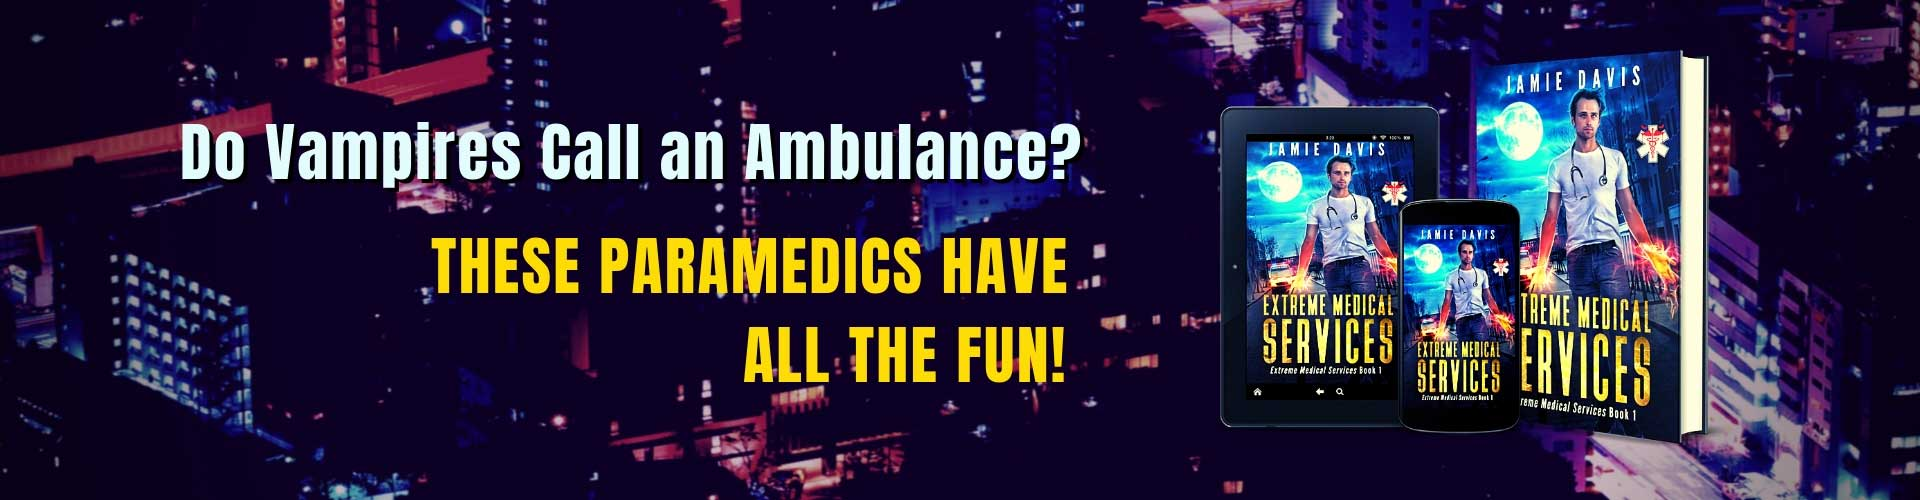 Extreme Medical Services Supernatural Paramedic Urban Fantasy Series